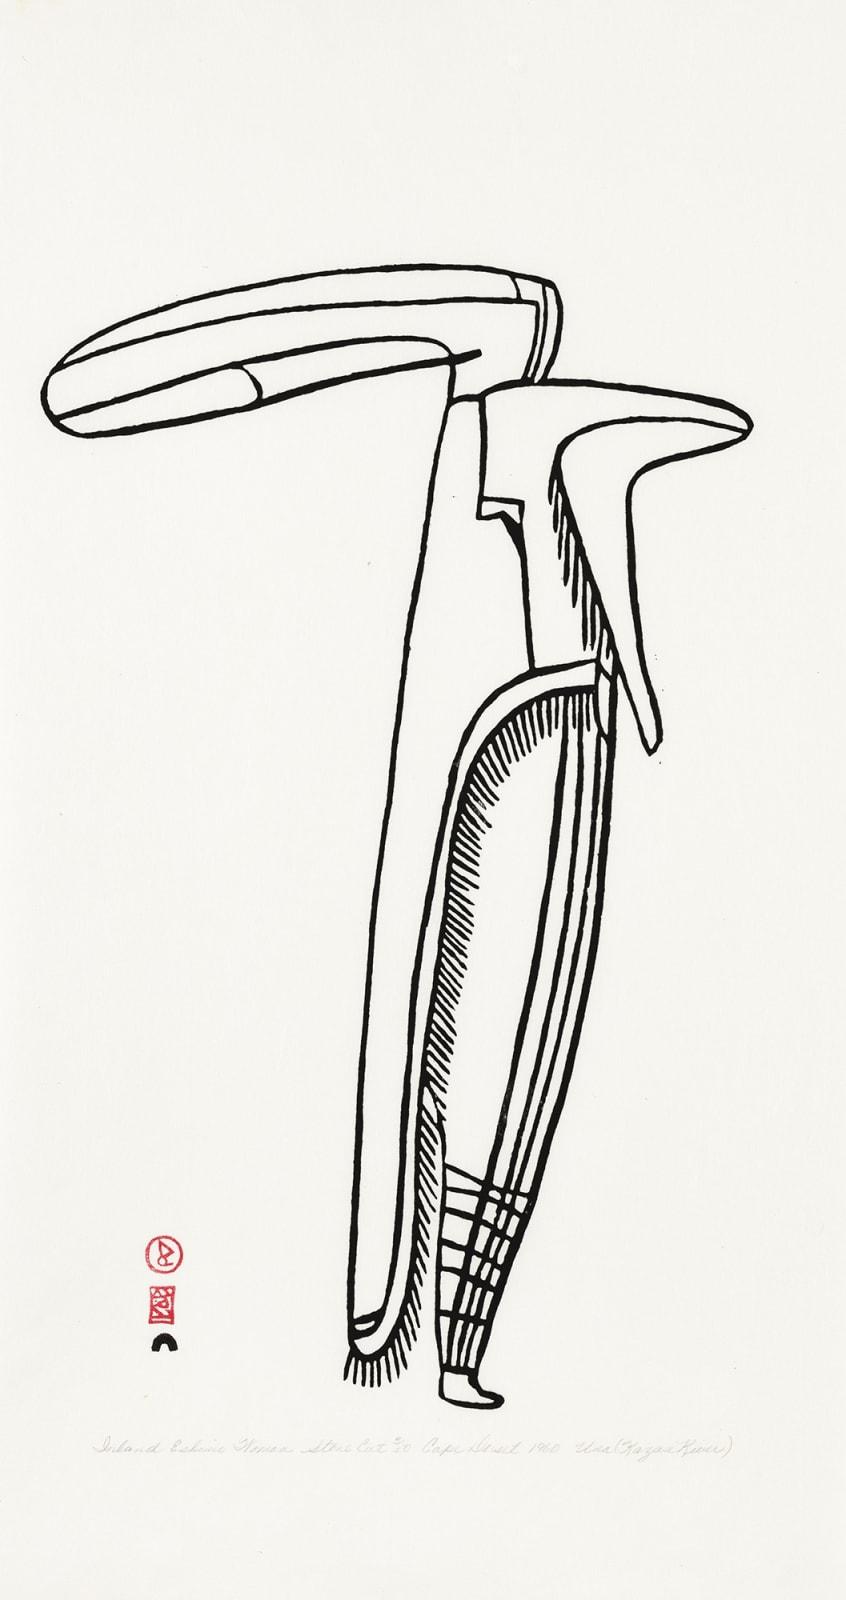 Lot 20 JESSIE OONARK, O.C., R.C.A (1906-1985) QAMANI'TUAQ (BAKER LAKE) Inland Eskimo Woman, 1960 #62 stonecut, 21.5 x 12.5 in (54.6 x 31.8 cm) Estimate: $8,000 — $12,000 PRICE REALIZED: $8,400